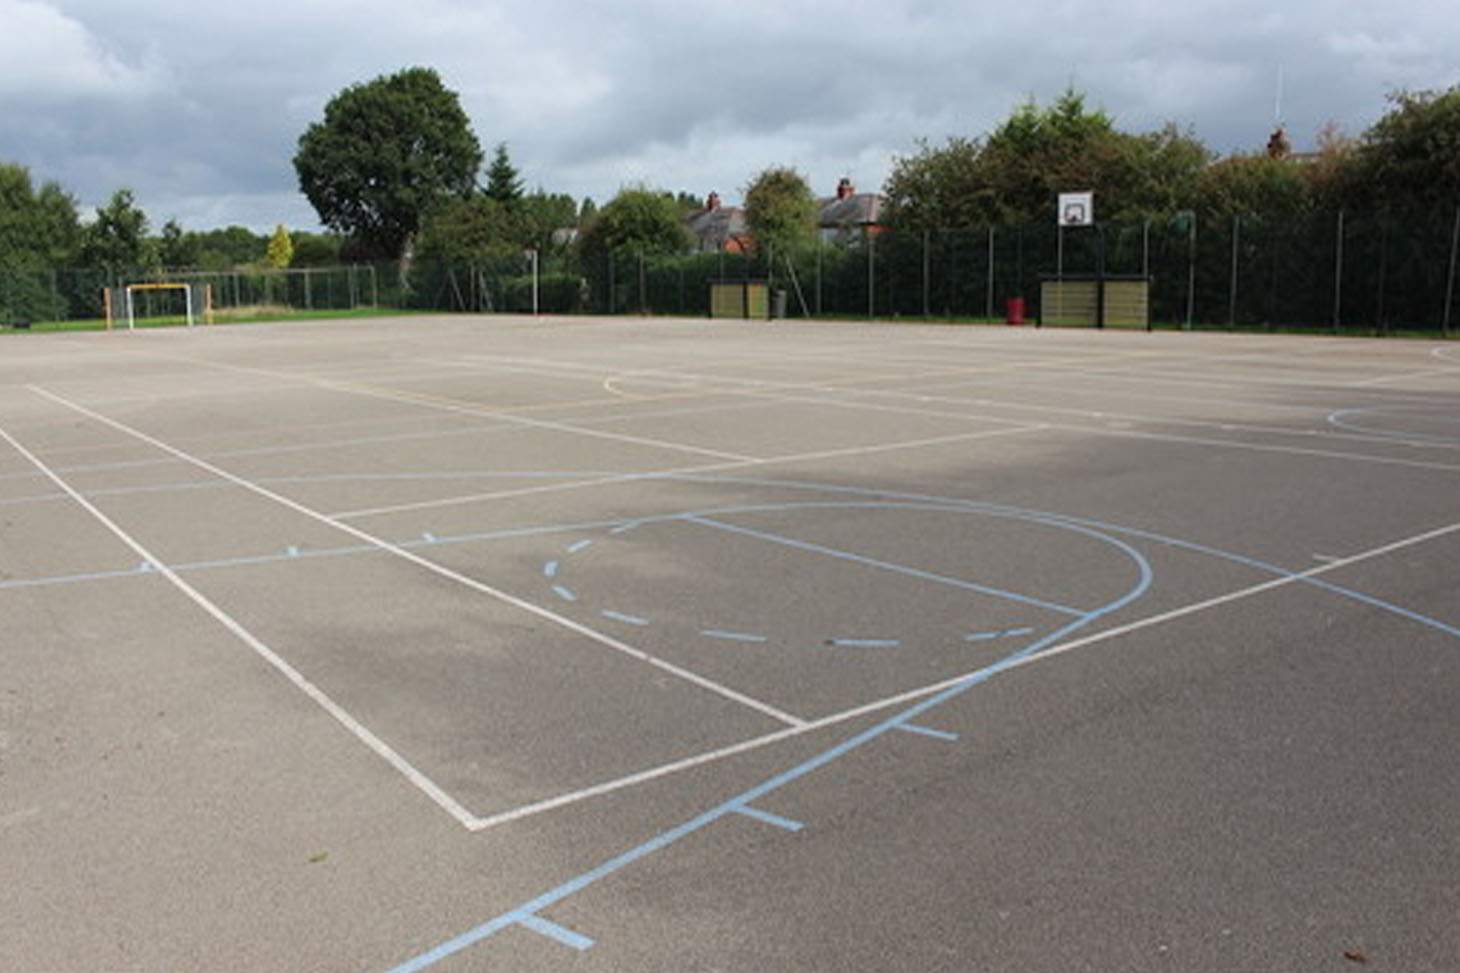 Ashton Community Science College Outdoor | Hard (macadam) tennis court